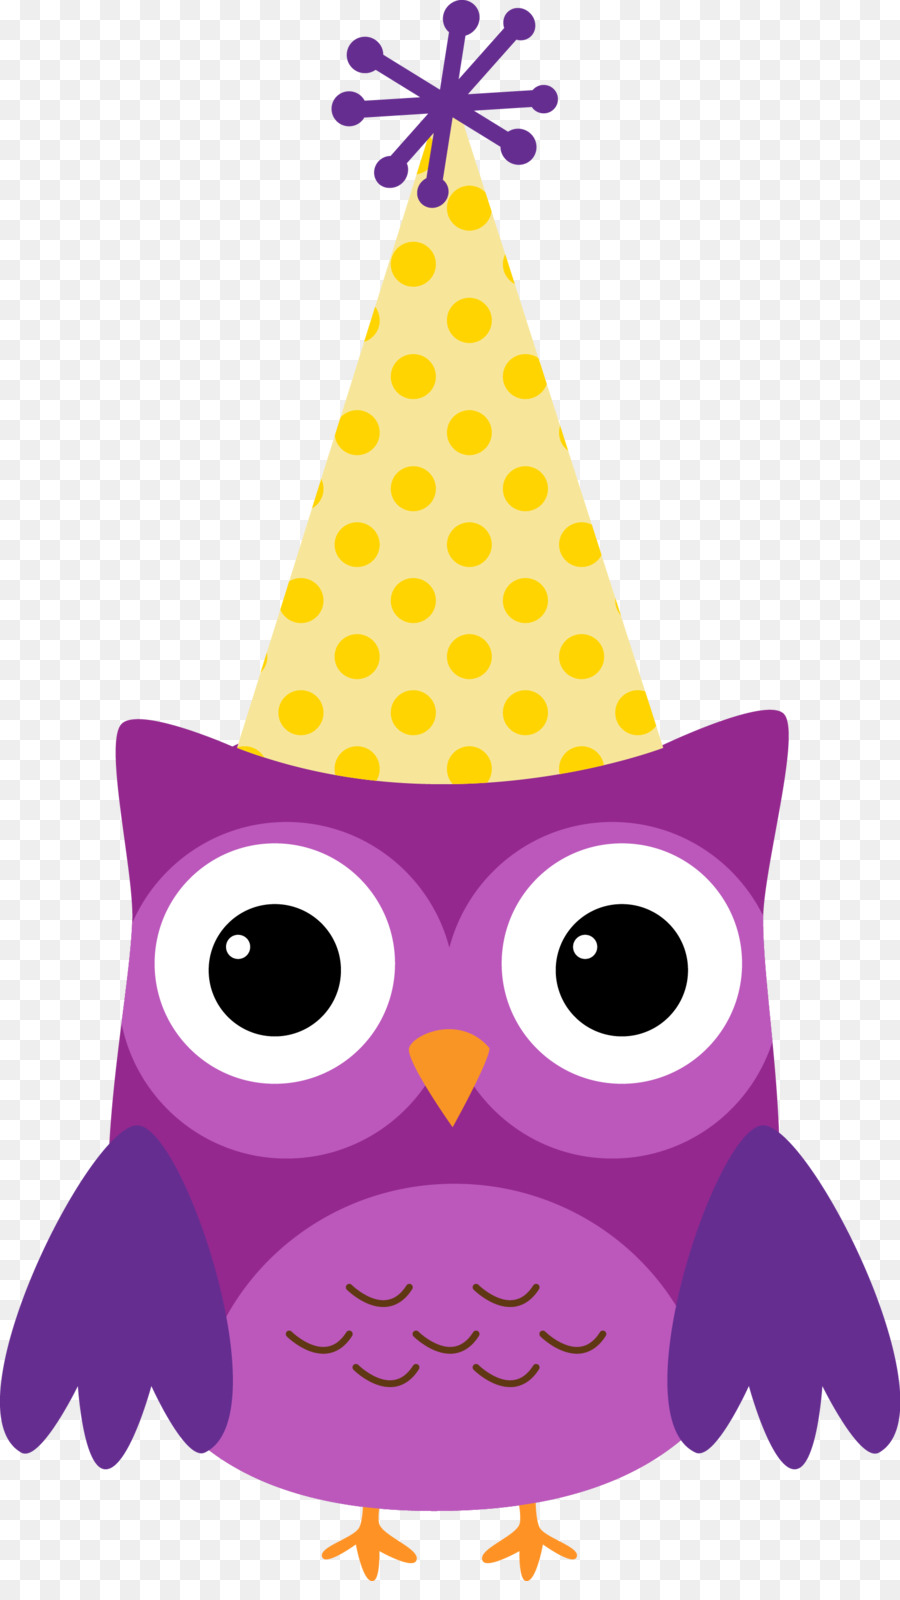 Birthday hat cartoon.